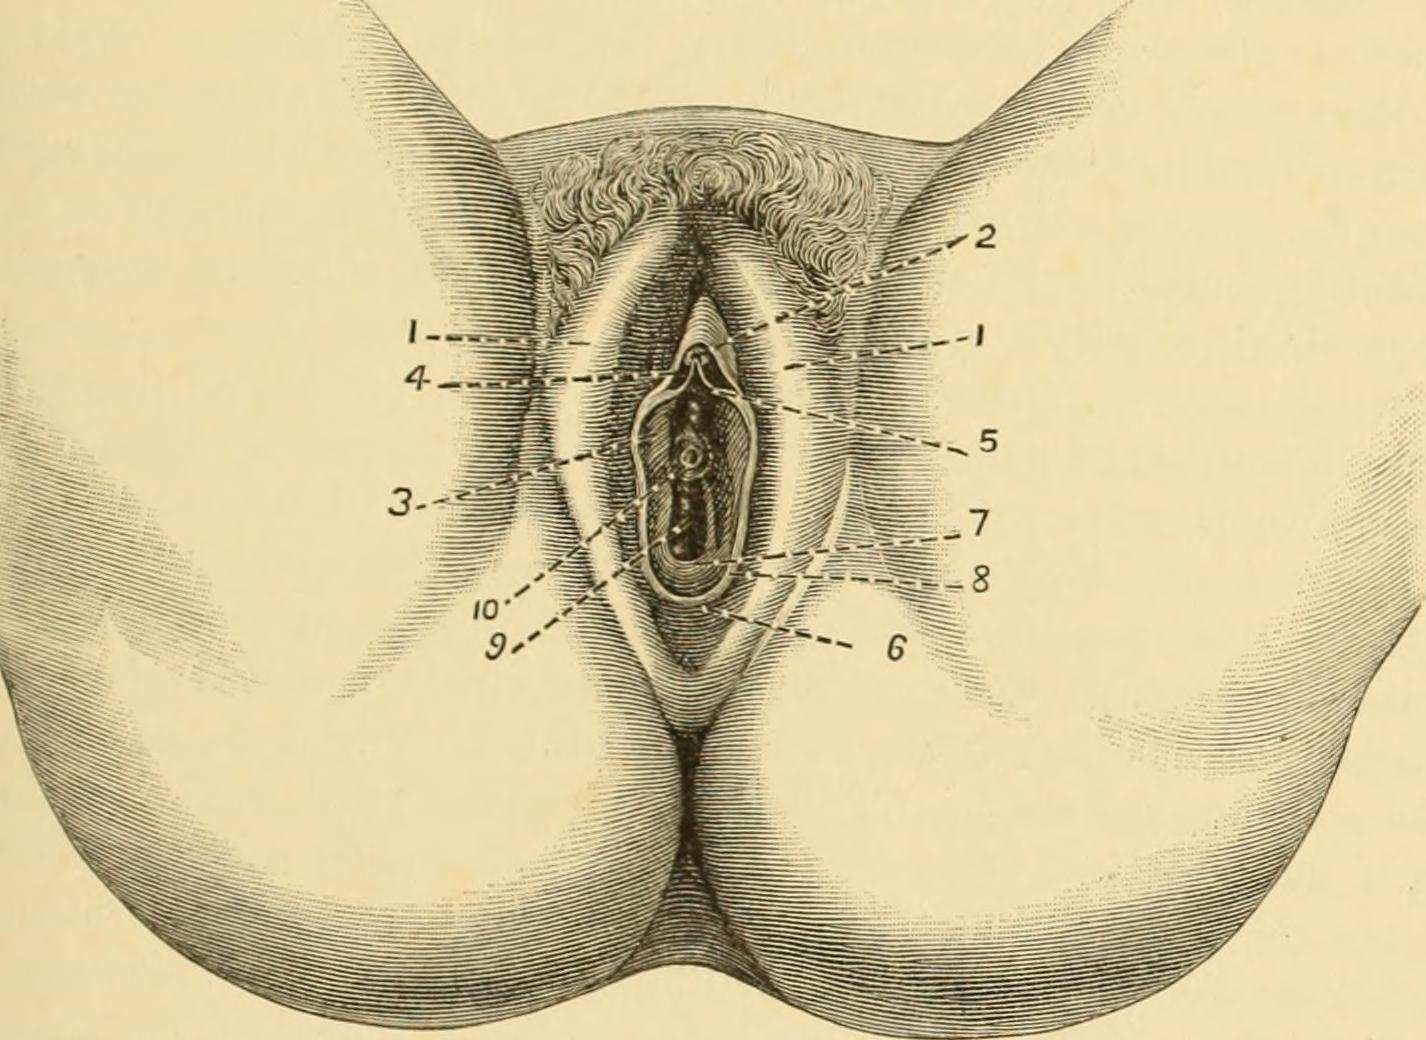 System of Gynecology